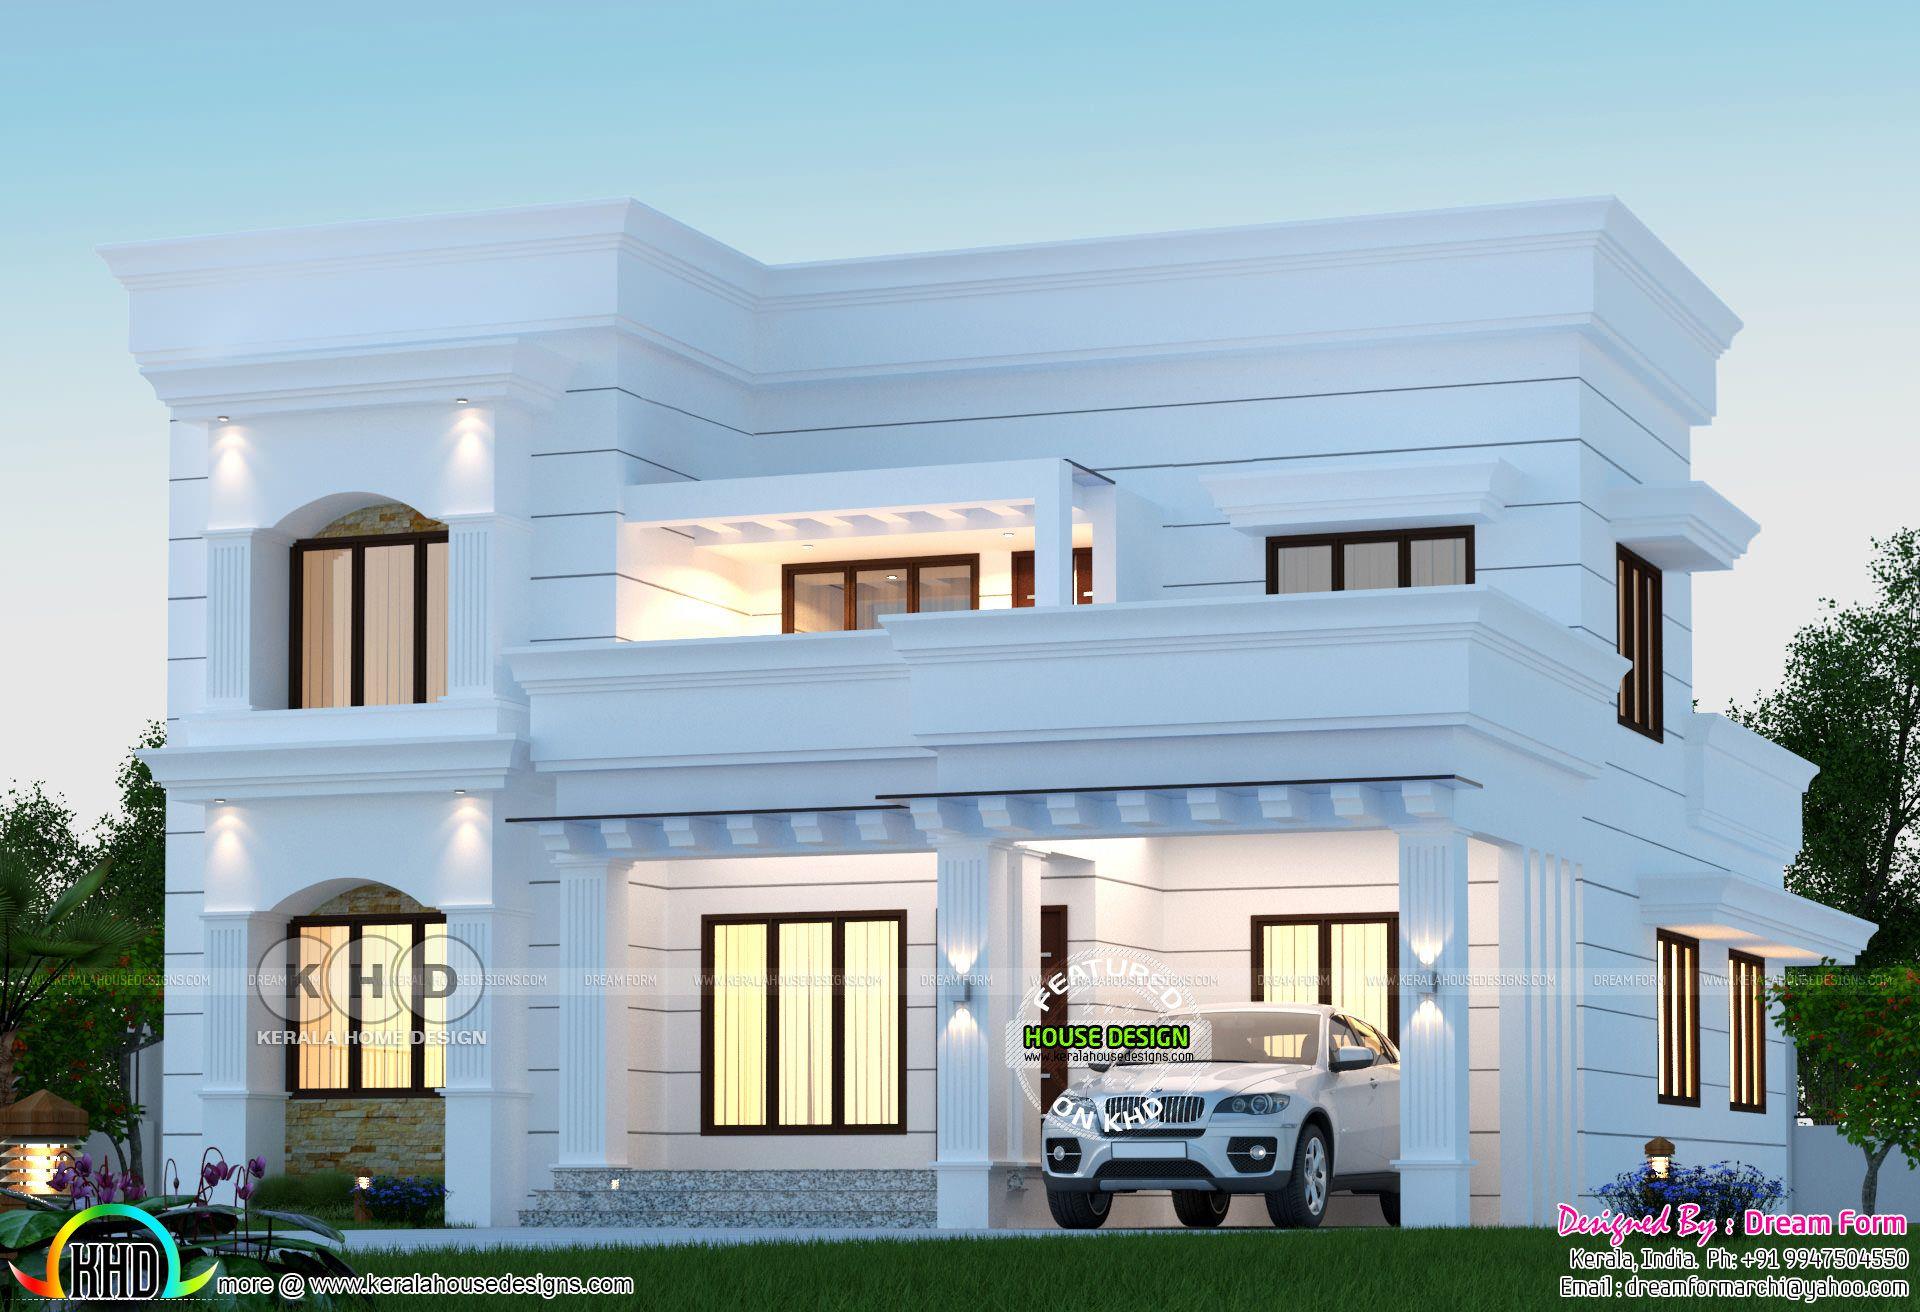 4 Bedrooms 2800 Square Feet Arabian Model Home Design In 2020 Bungalow House Design Kerala House Design Duplex House Design